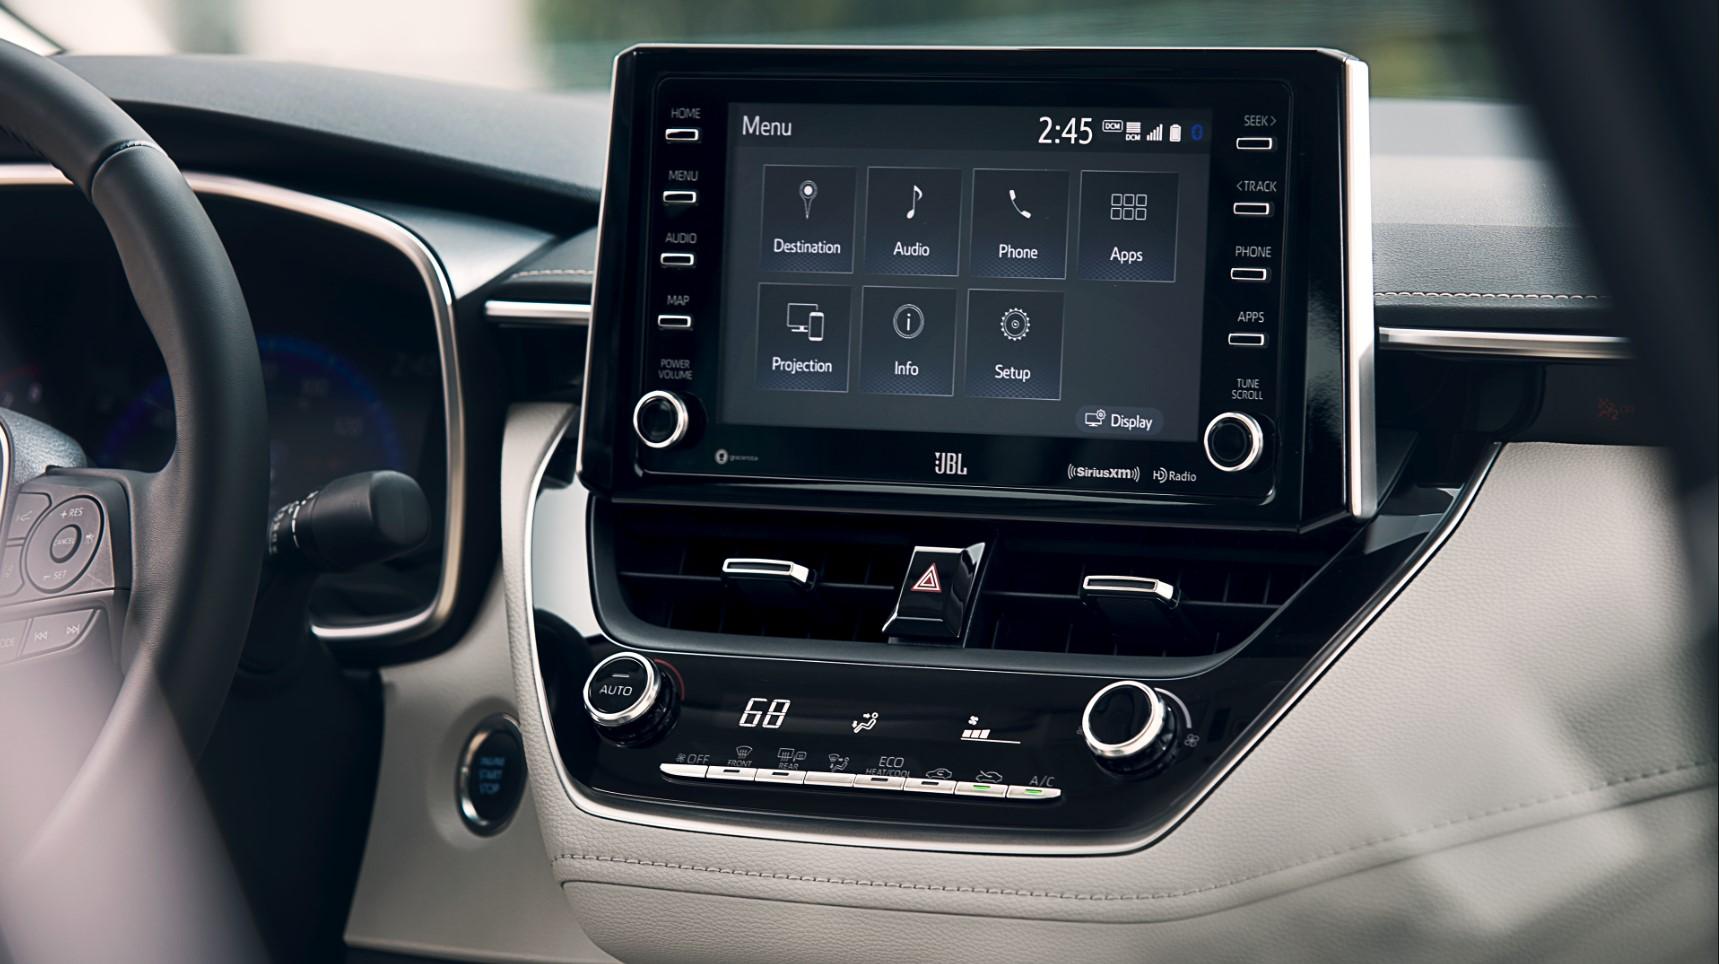 2020 Corolla Hybrid Infotainment System